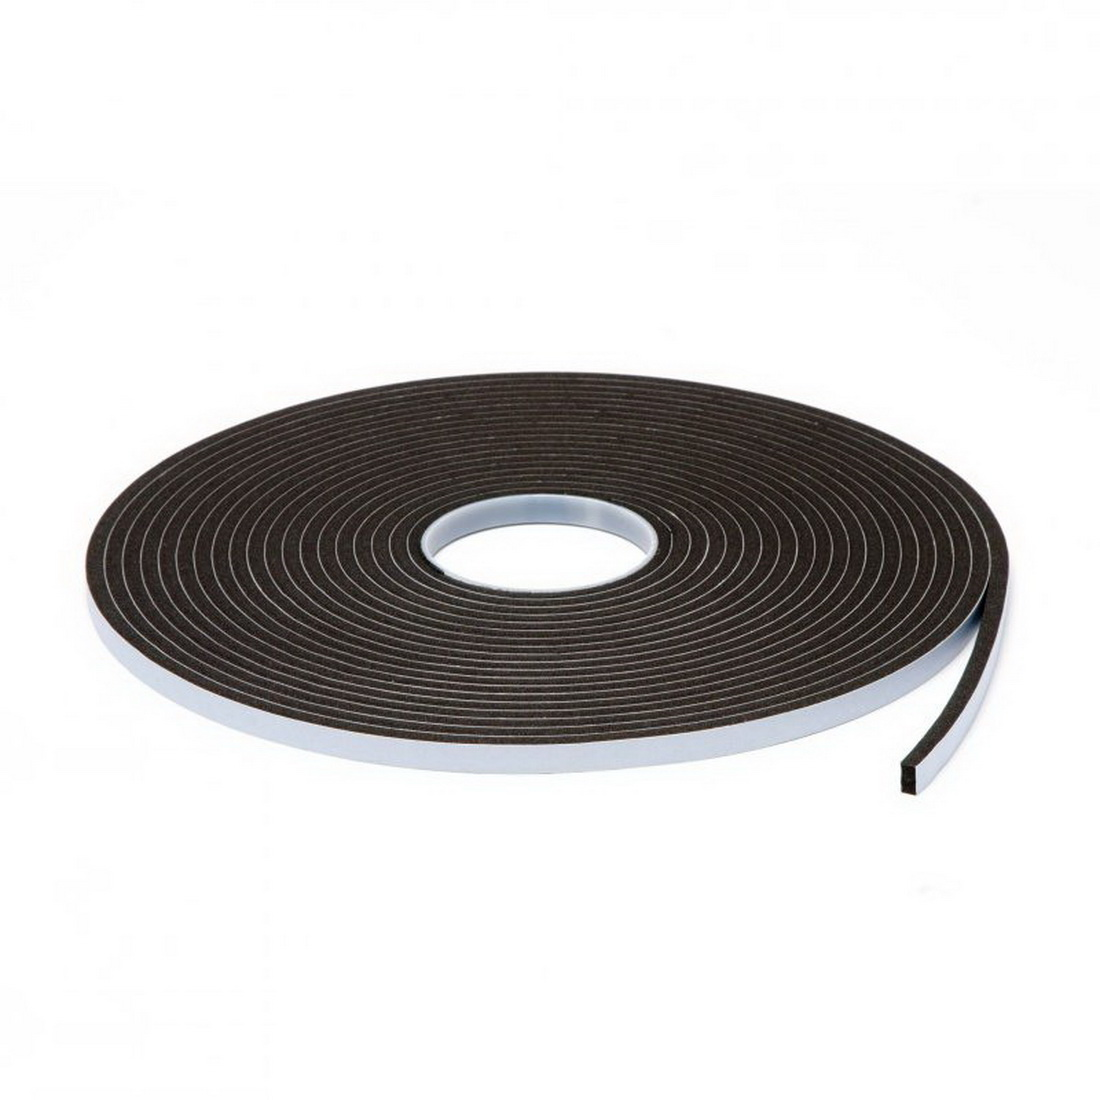 Sellotape 3109 Single Sided Foam Tape 19mm x 15mm x 5m Black